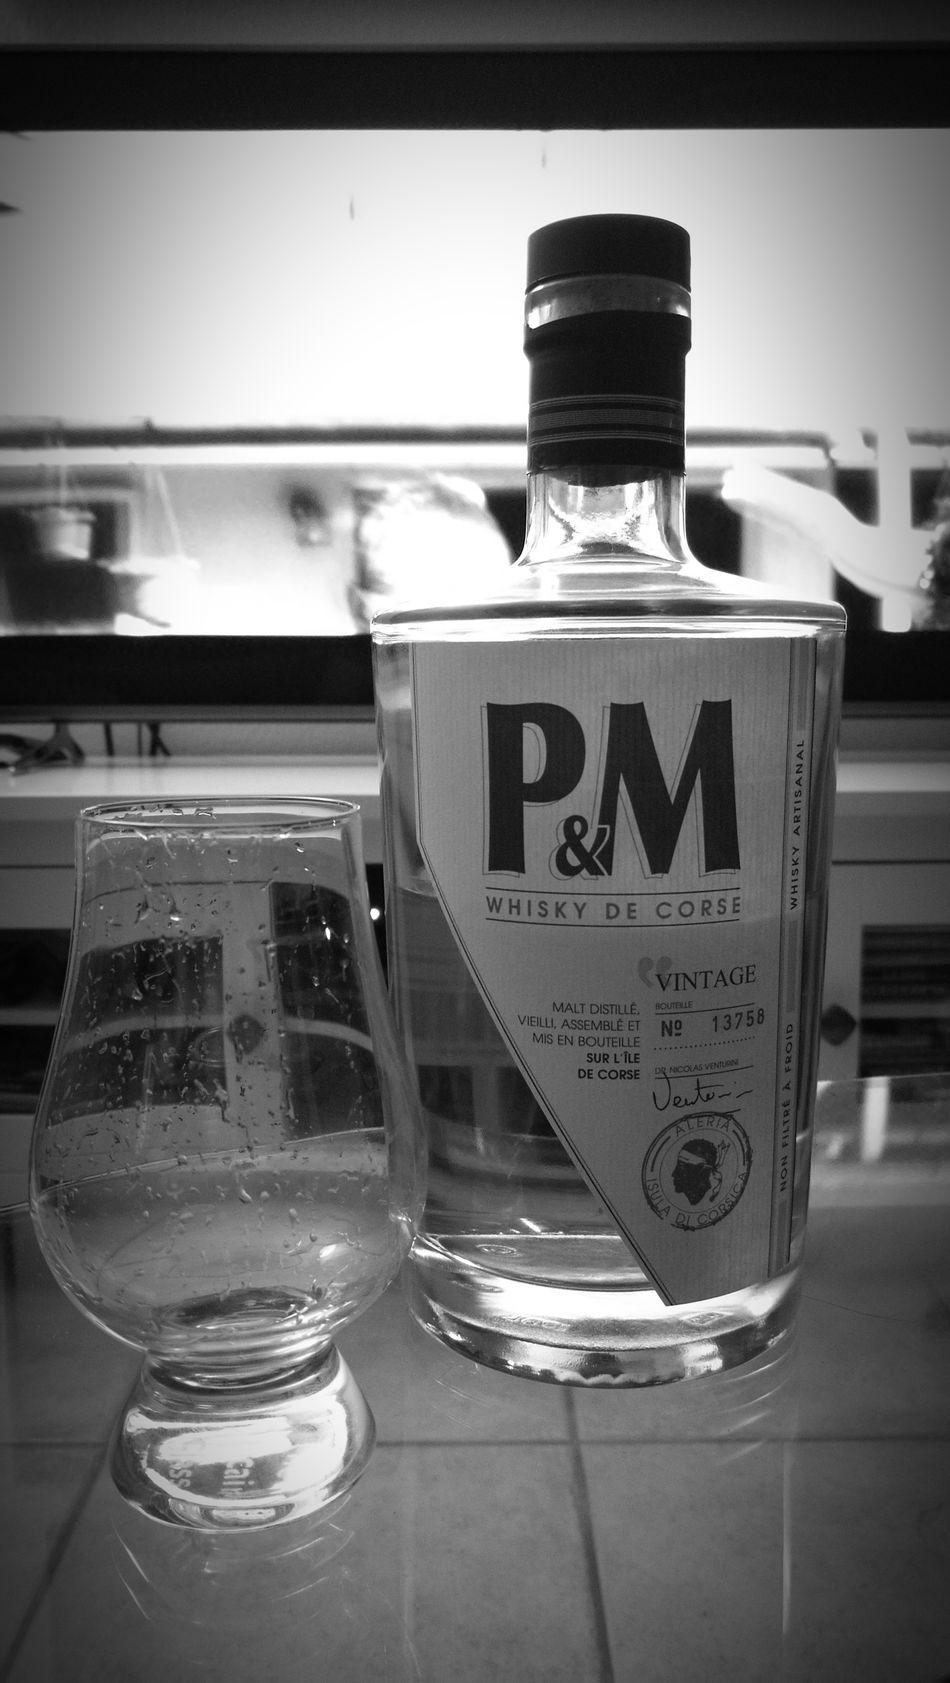 Corsican Blended Whisky Pm Vintage Glencairnglass Verre Slàinte Santé Cheers Salute